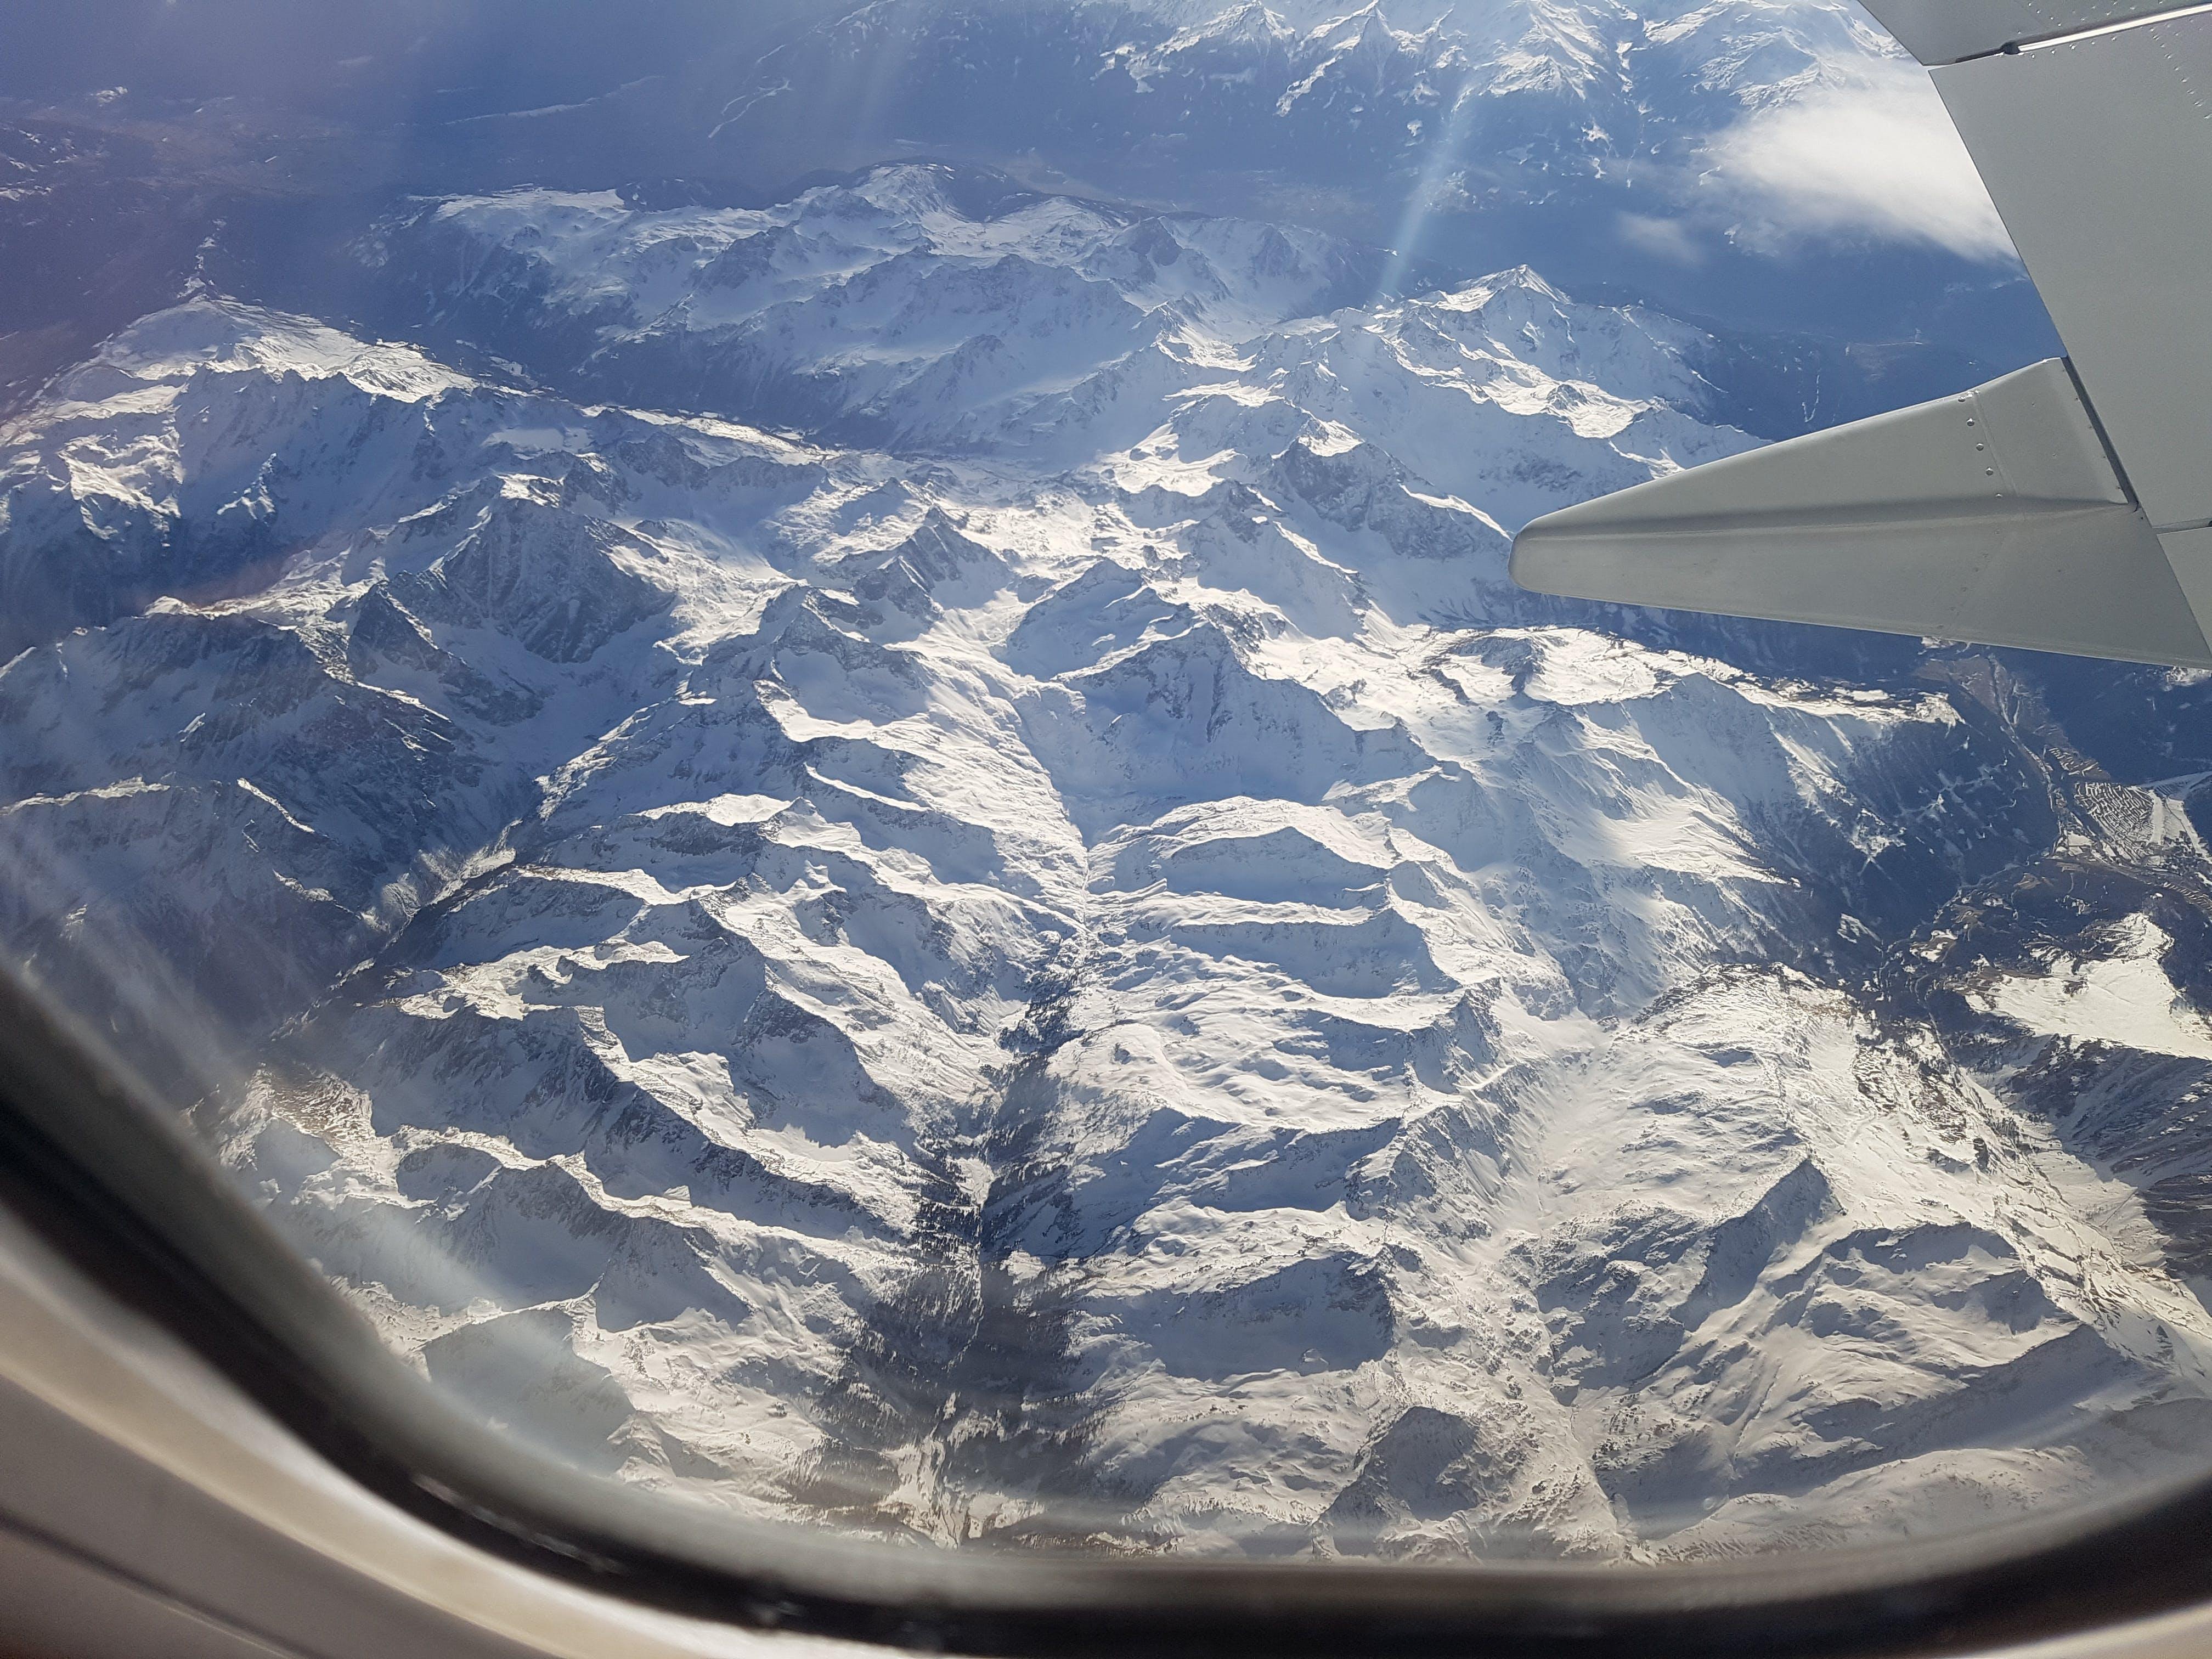 Free stock photo of on airplane above mountains snow